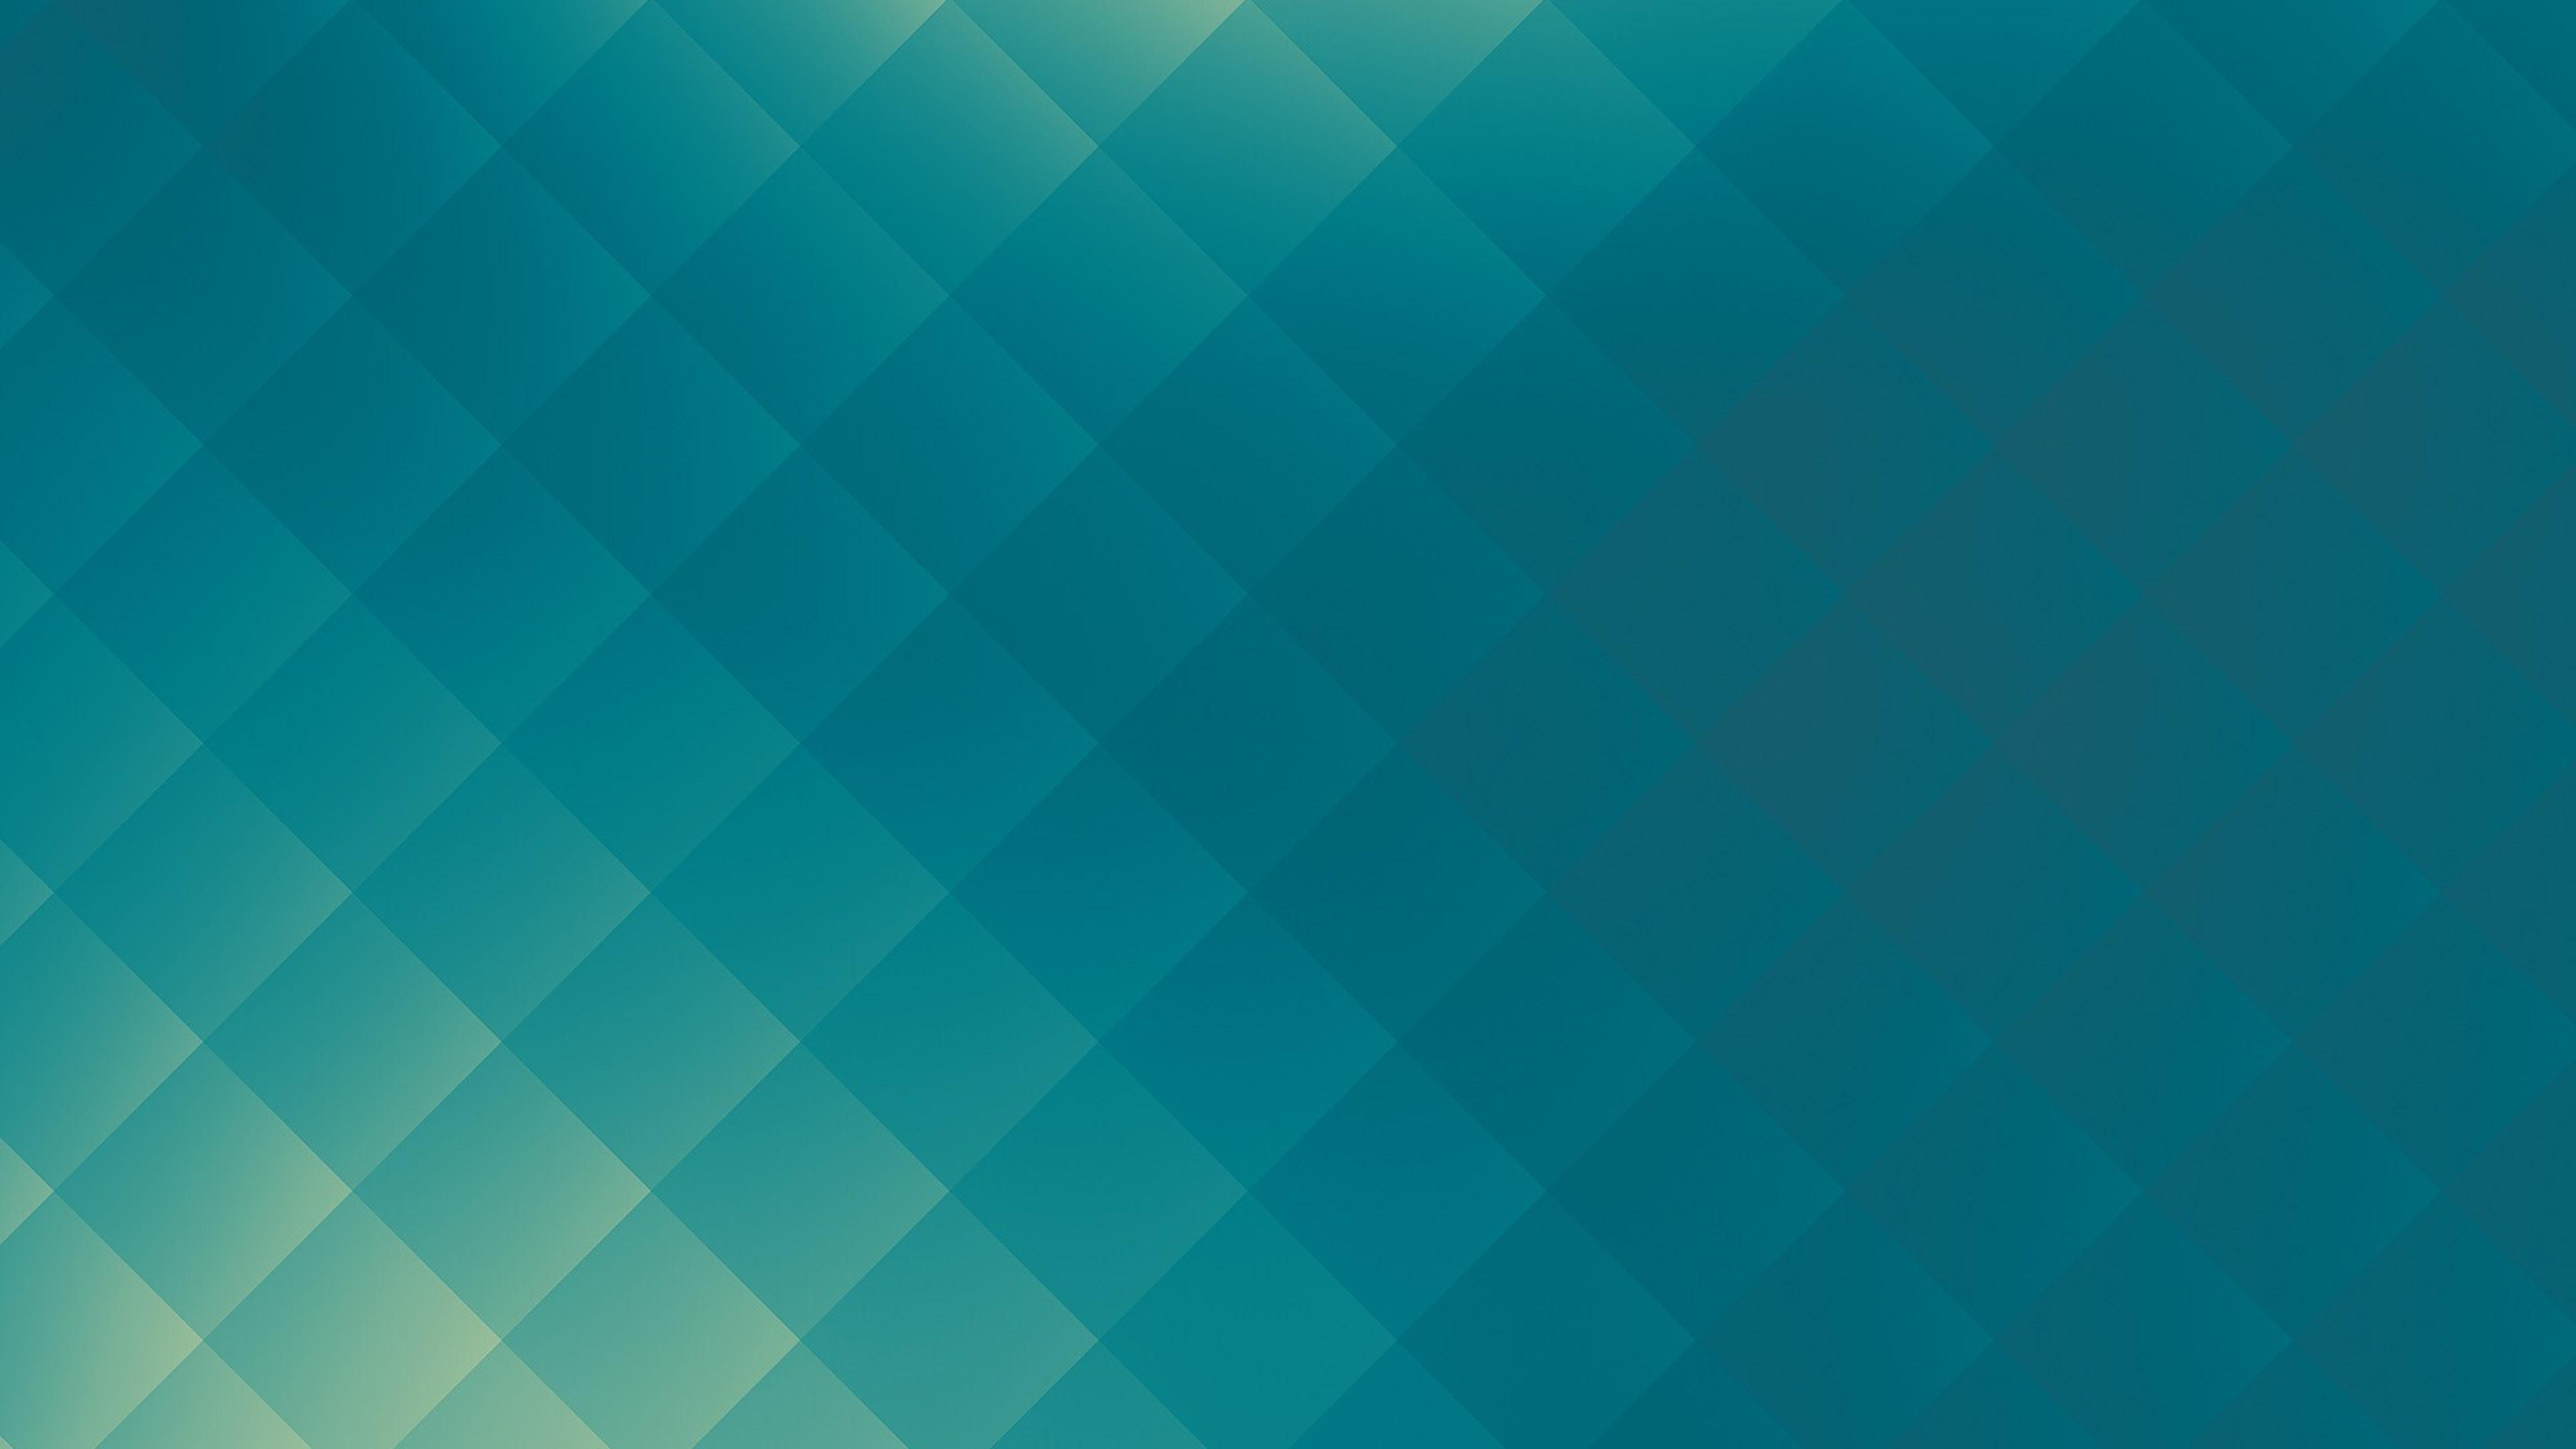 2048x1152 gradient texture cubes 2048x1152 resolution hd